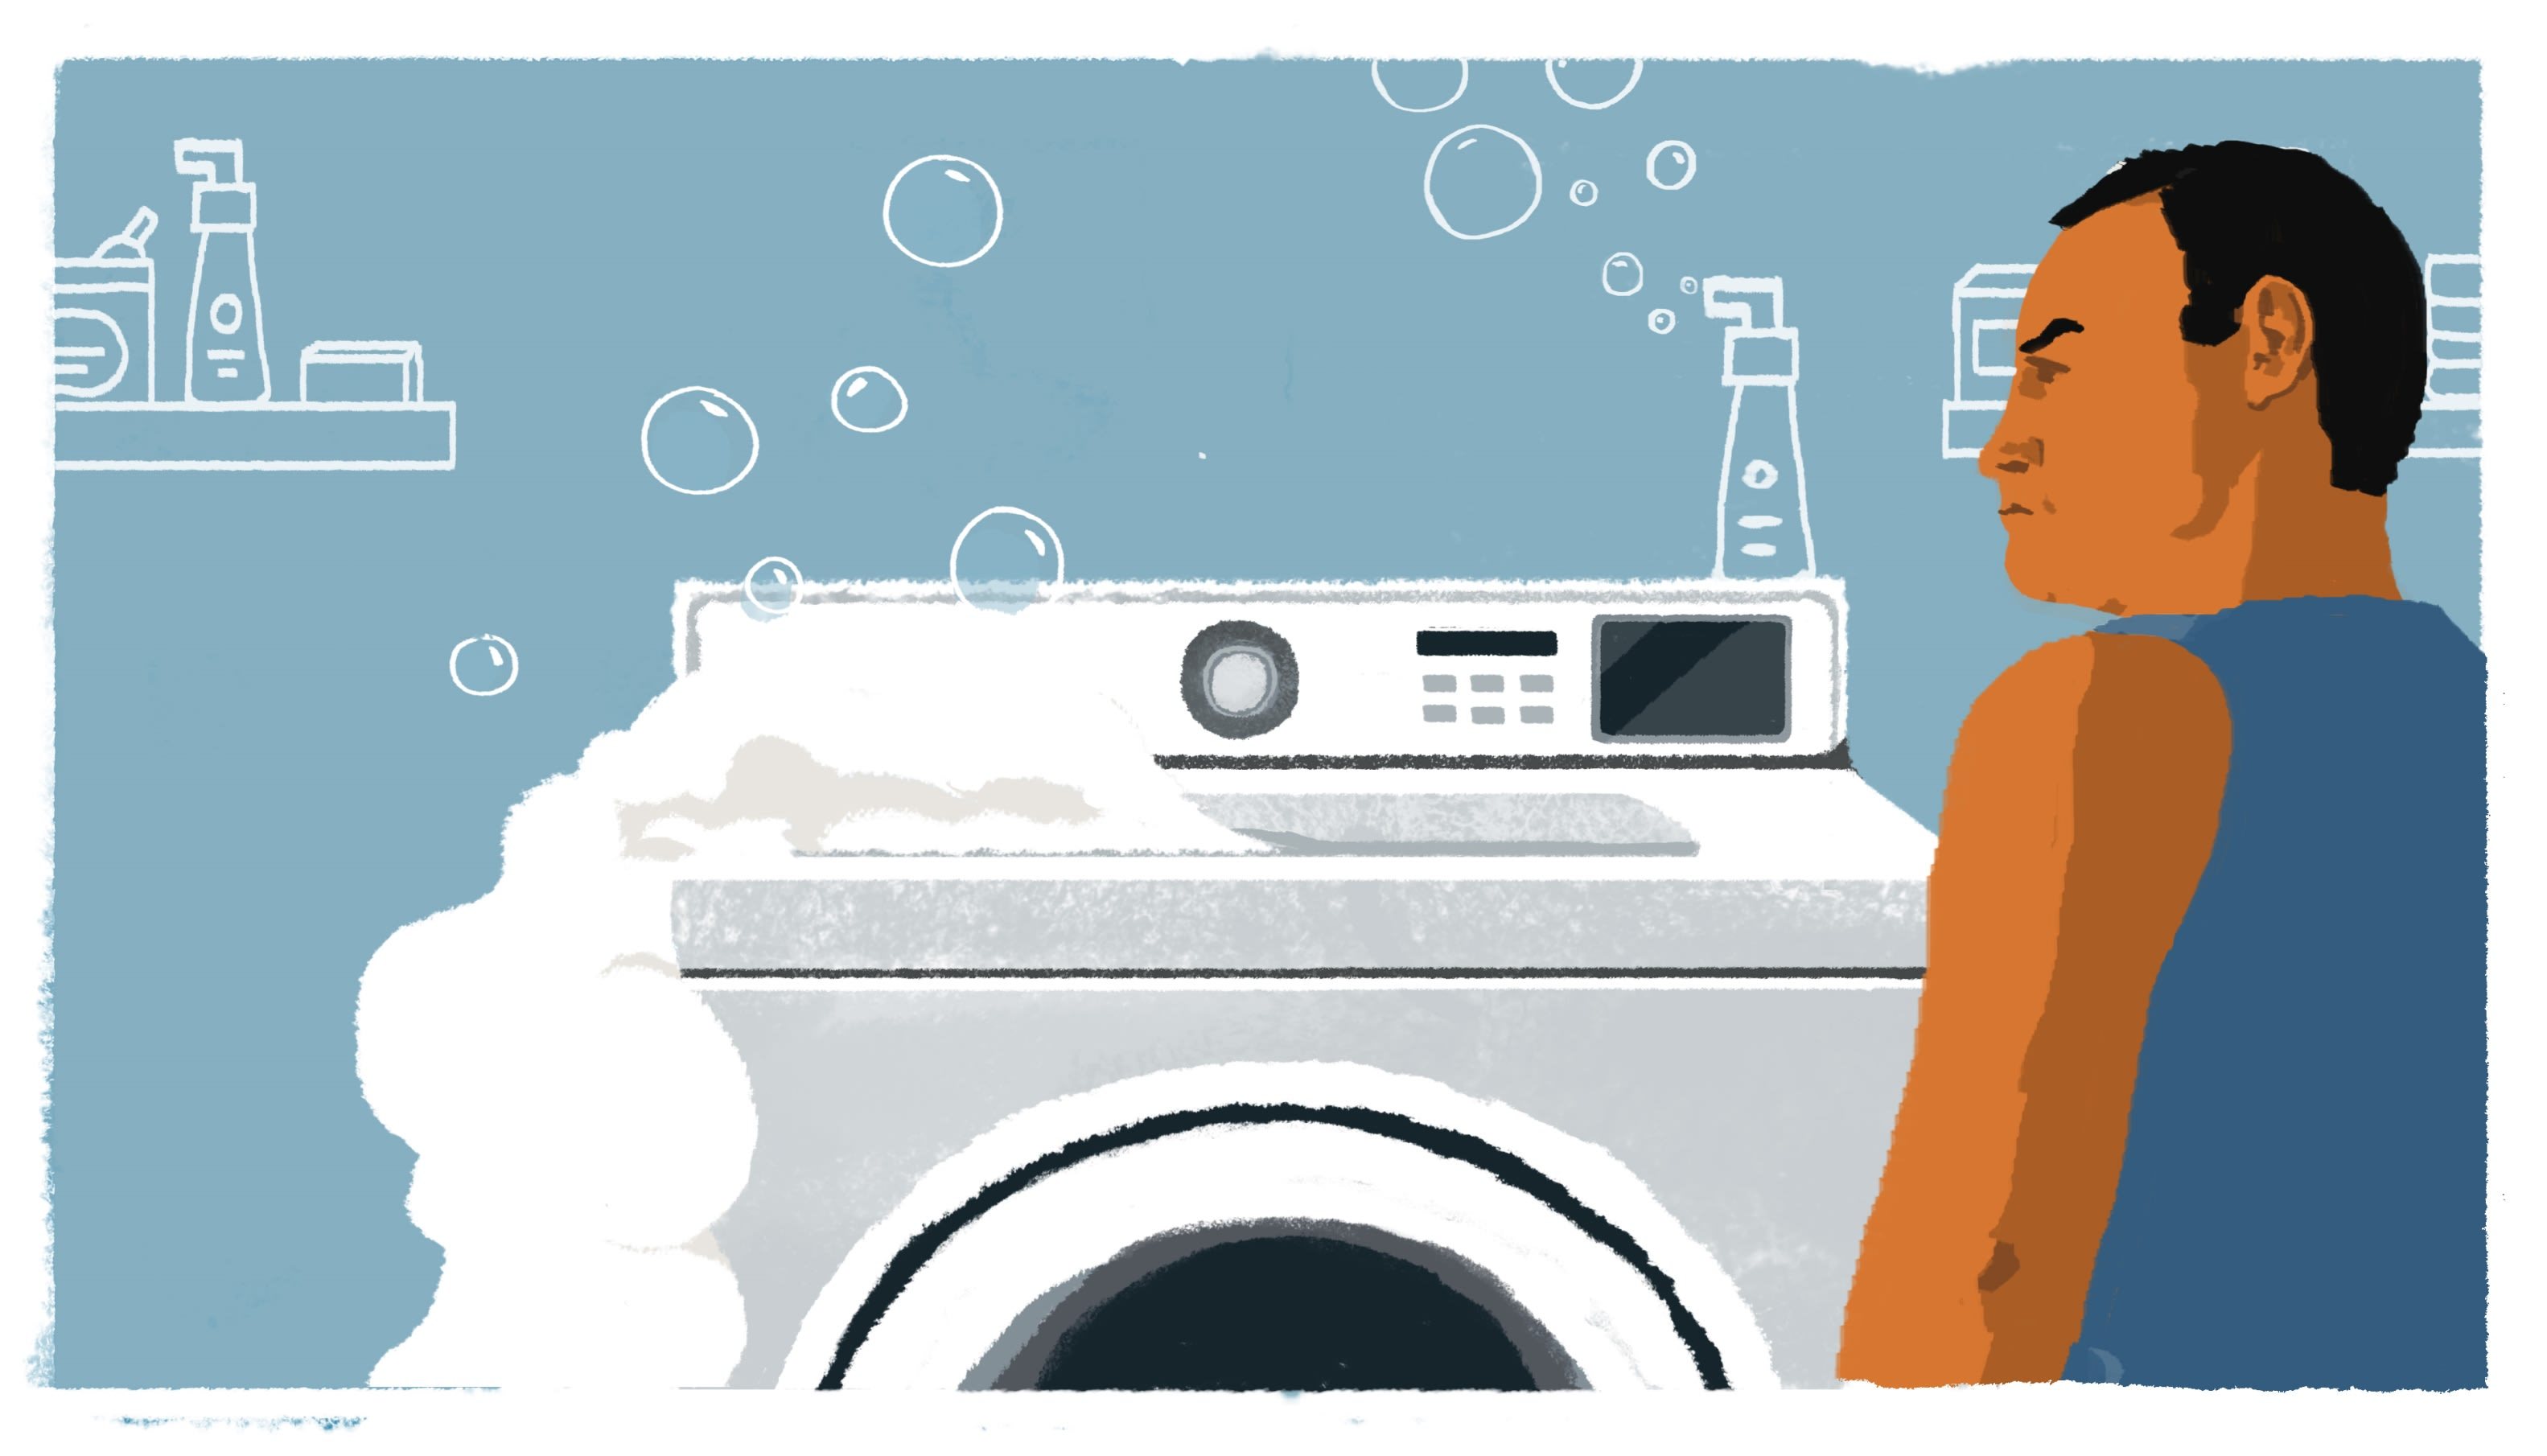 noble-trainer-illustration-laundry